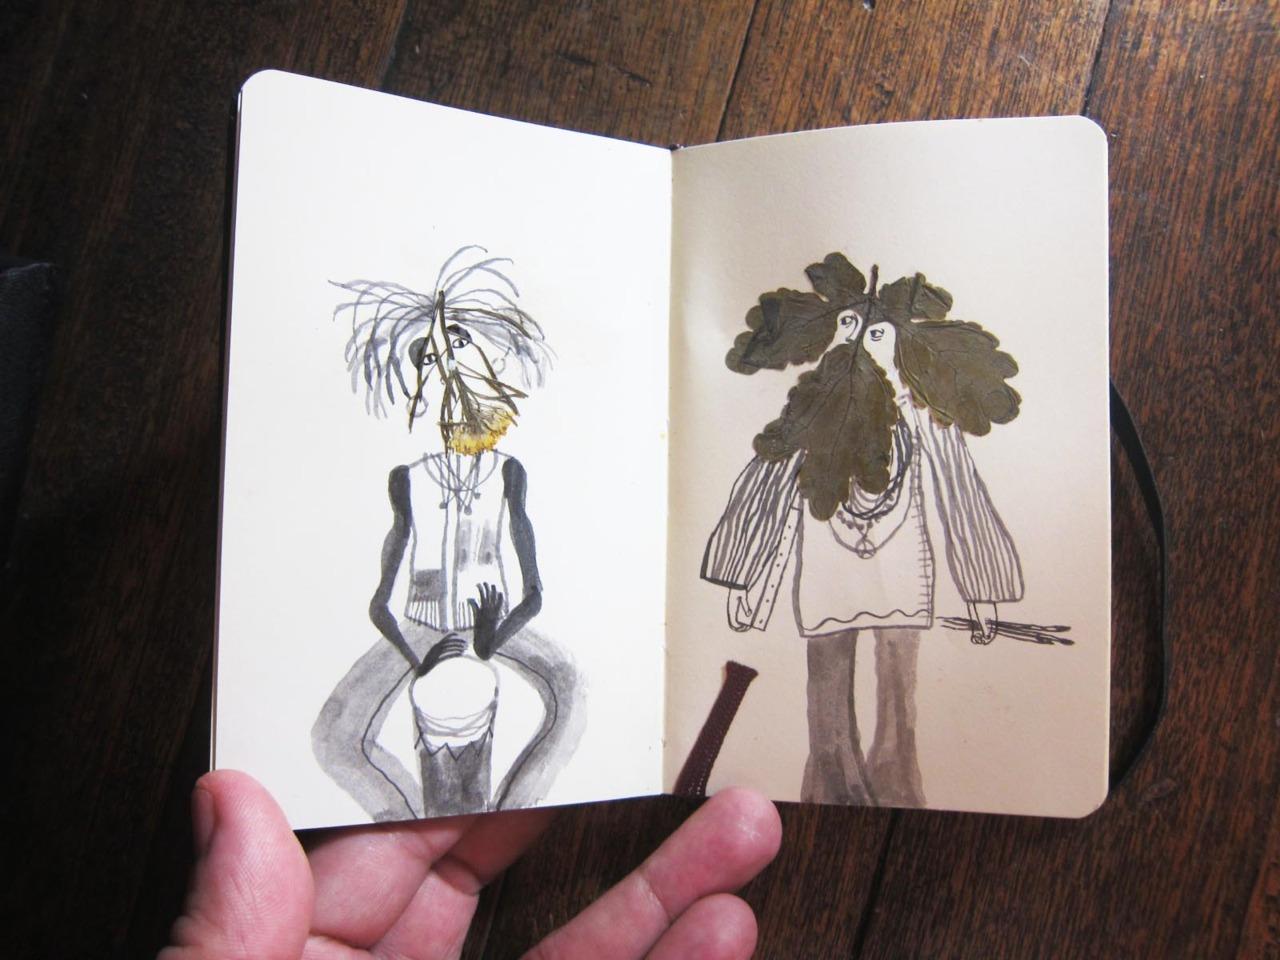 herbier feuille illustration 08 Un herbier illustré